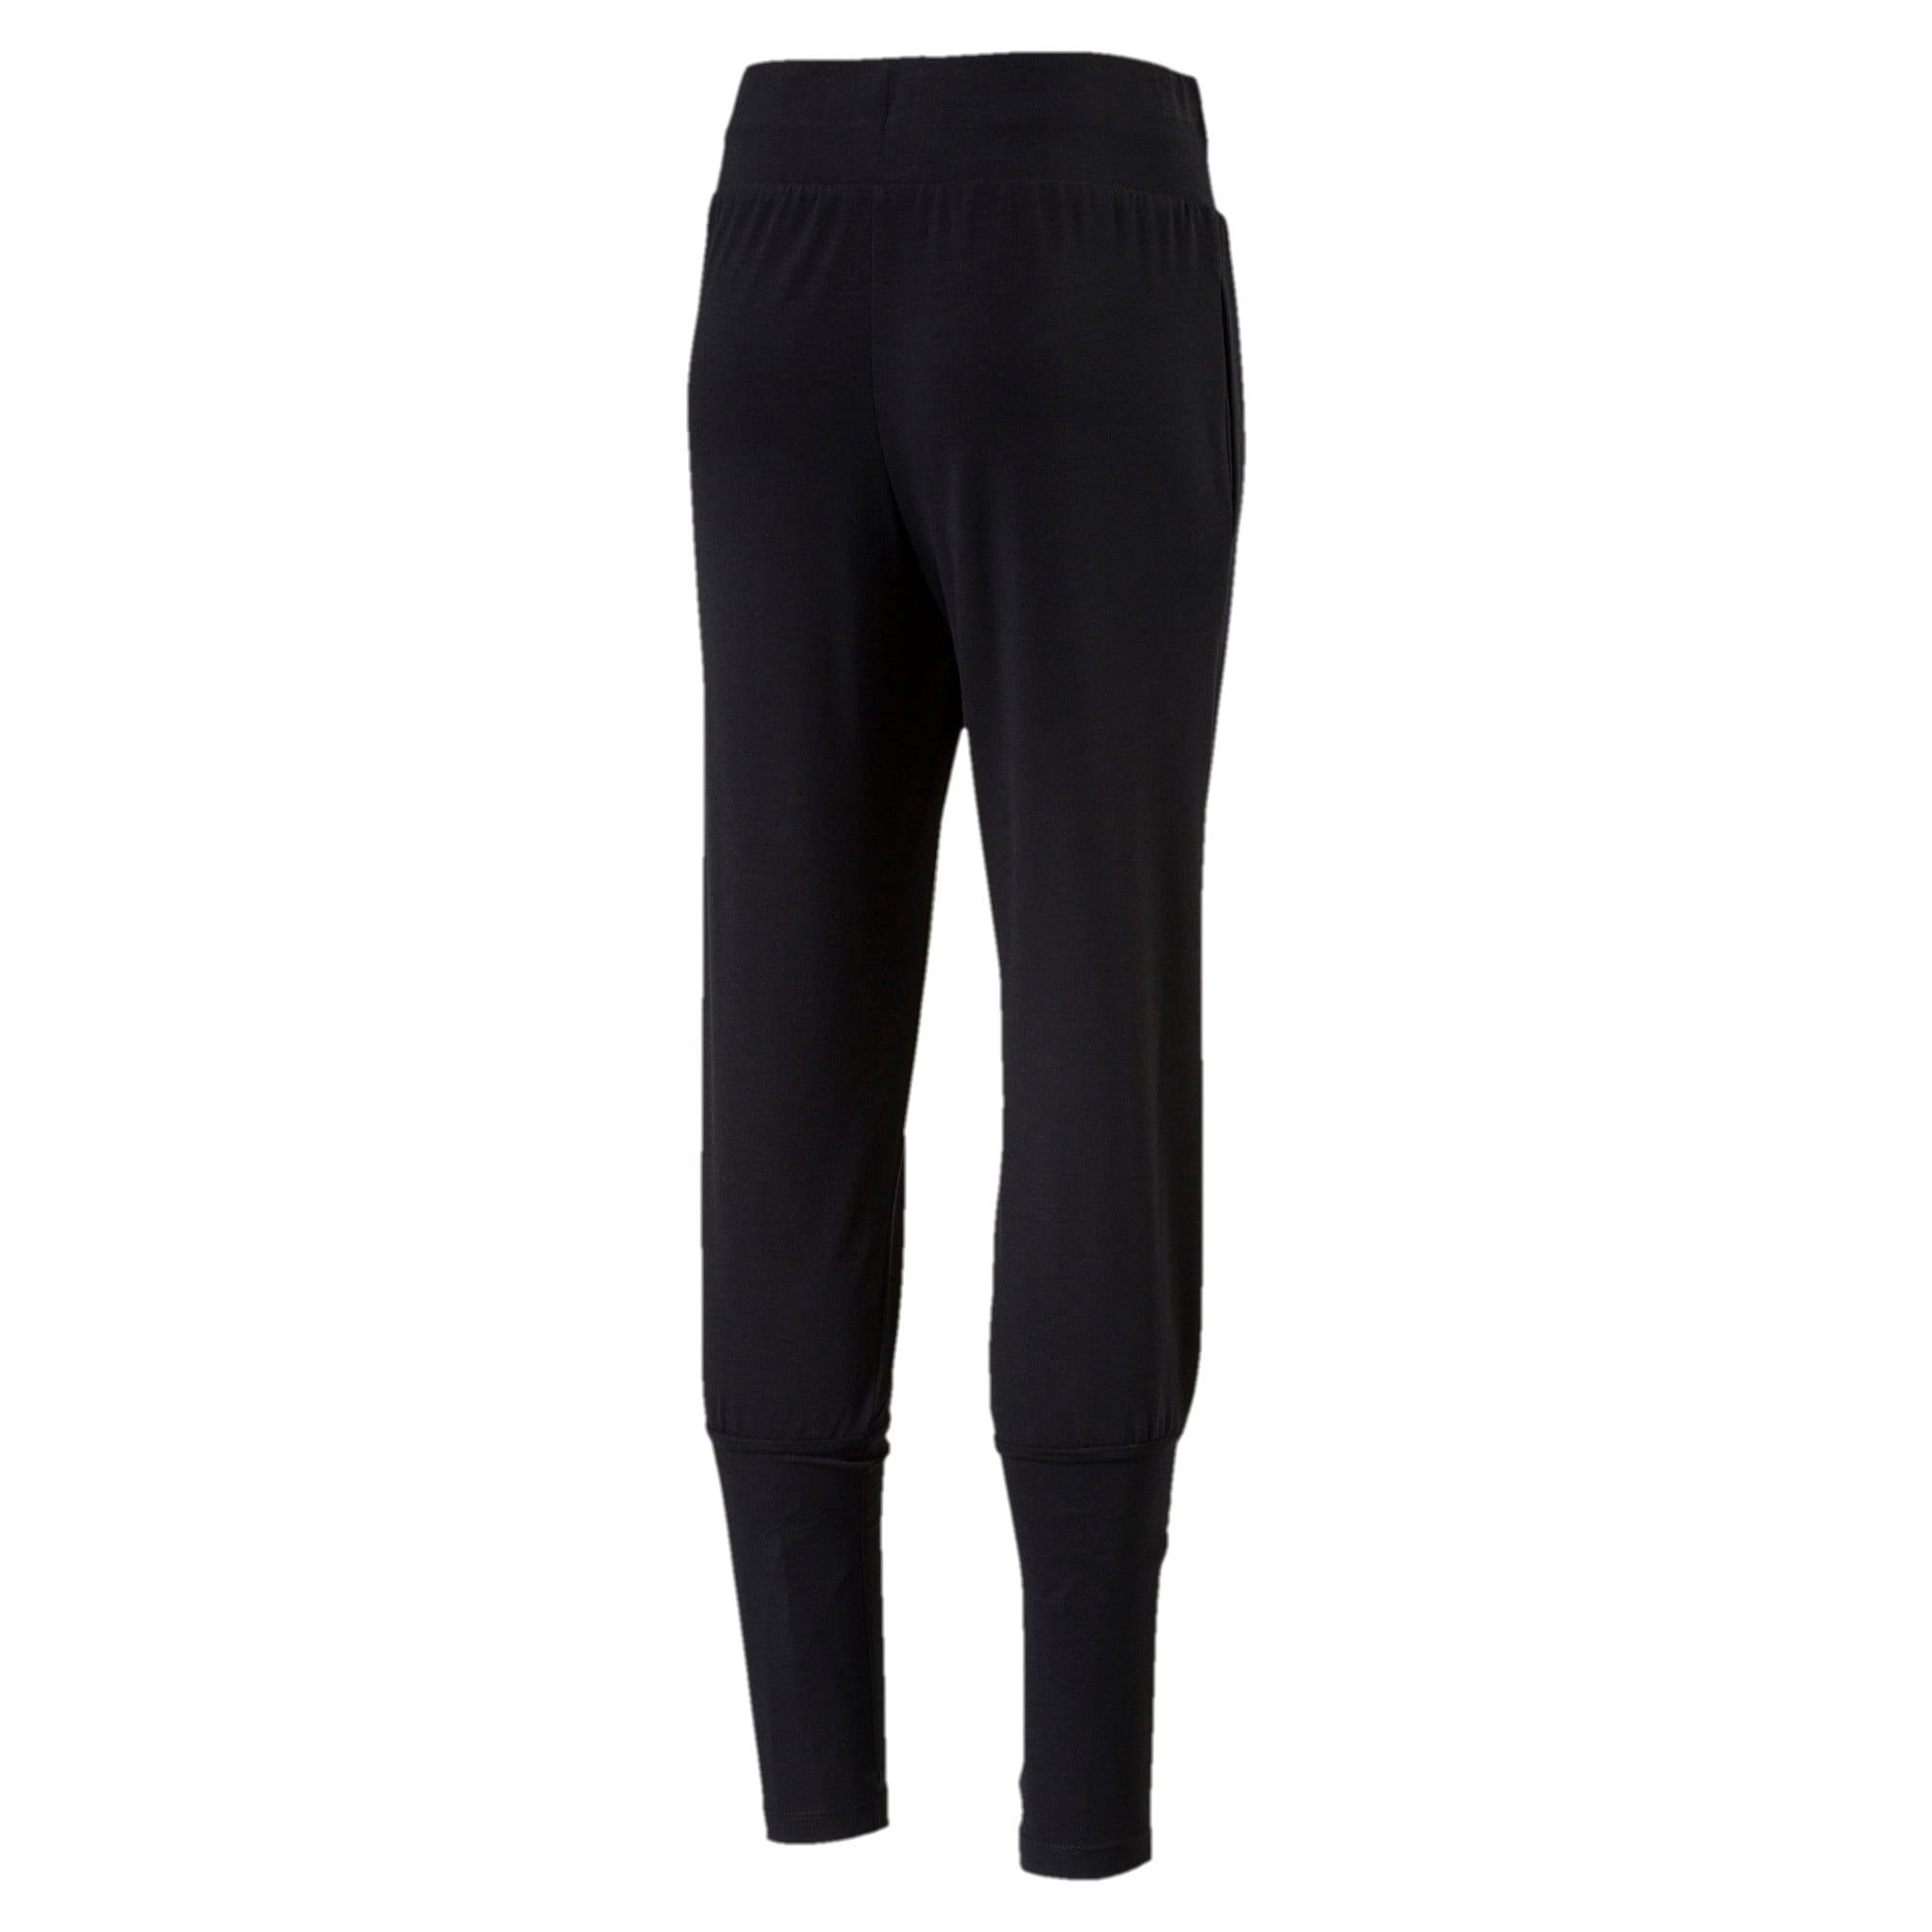 Thumbnail 2 of Girls' Softsport Jersey Pants, Puma Black, medium-IND